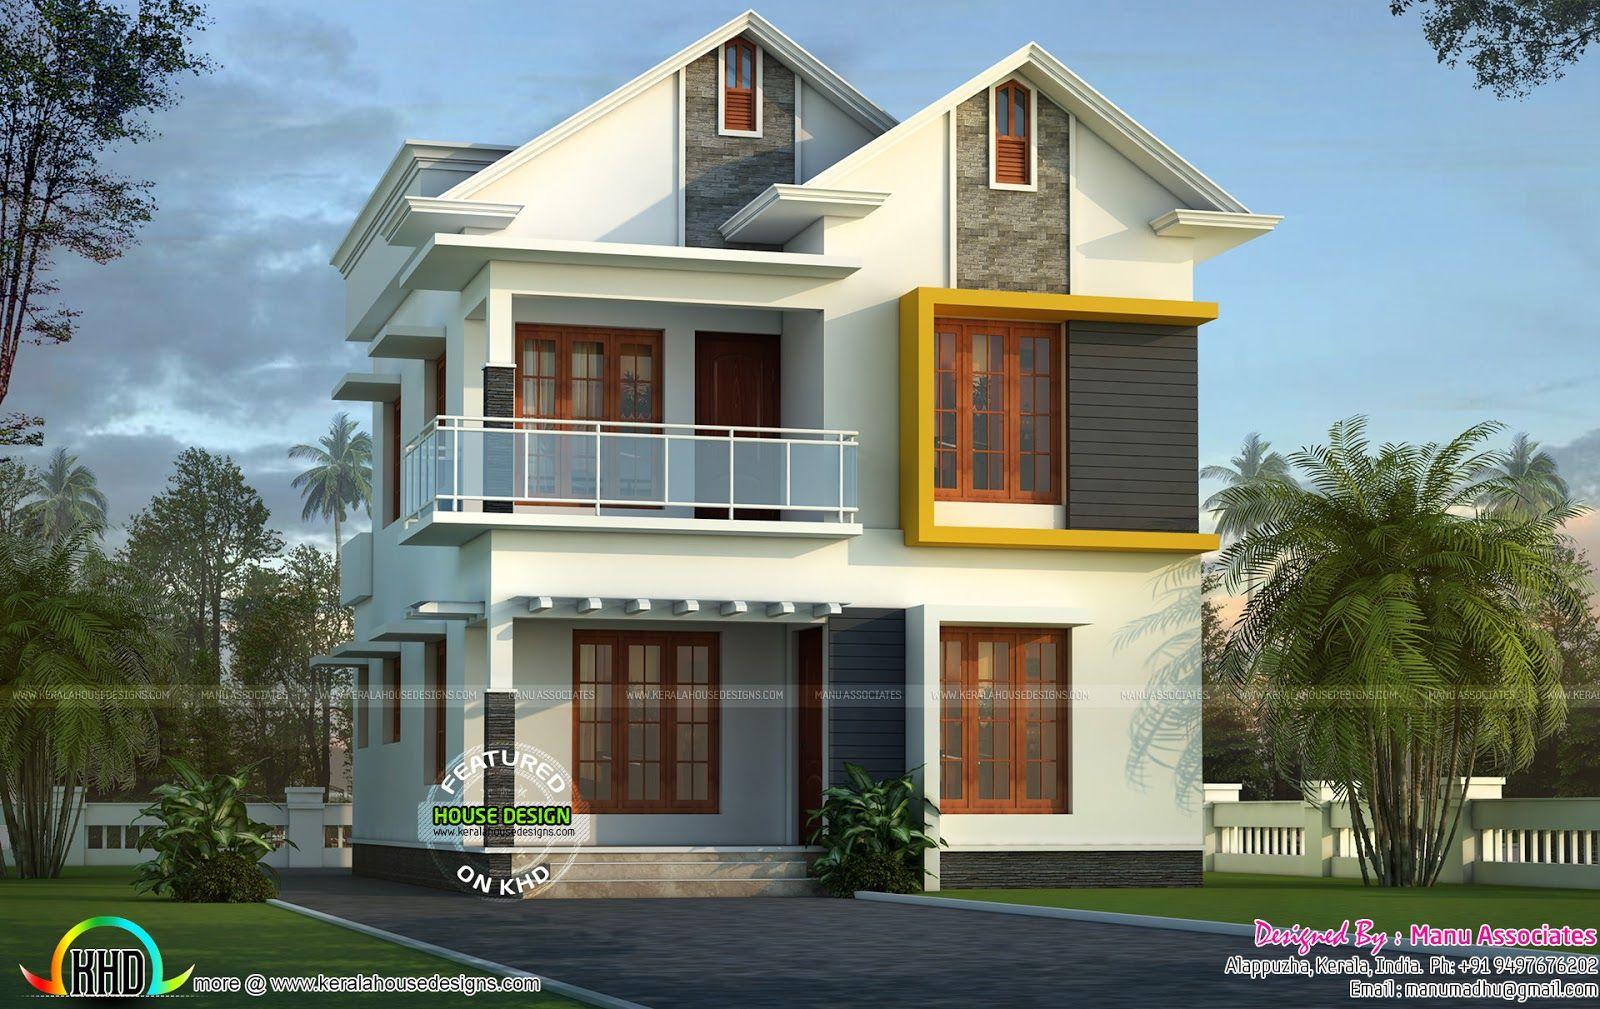 Cute Small Kerala Home Design Kerala House Design Small